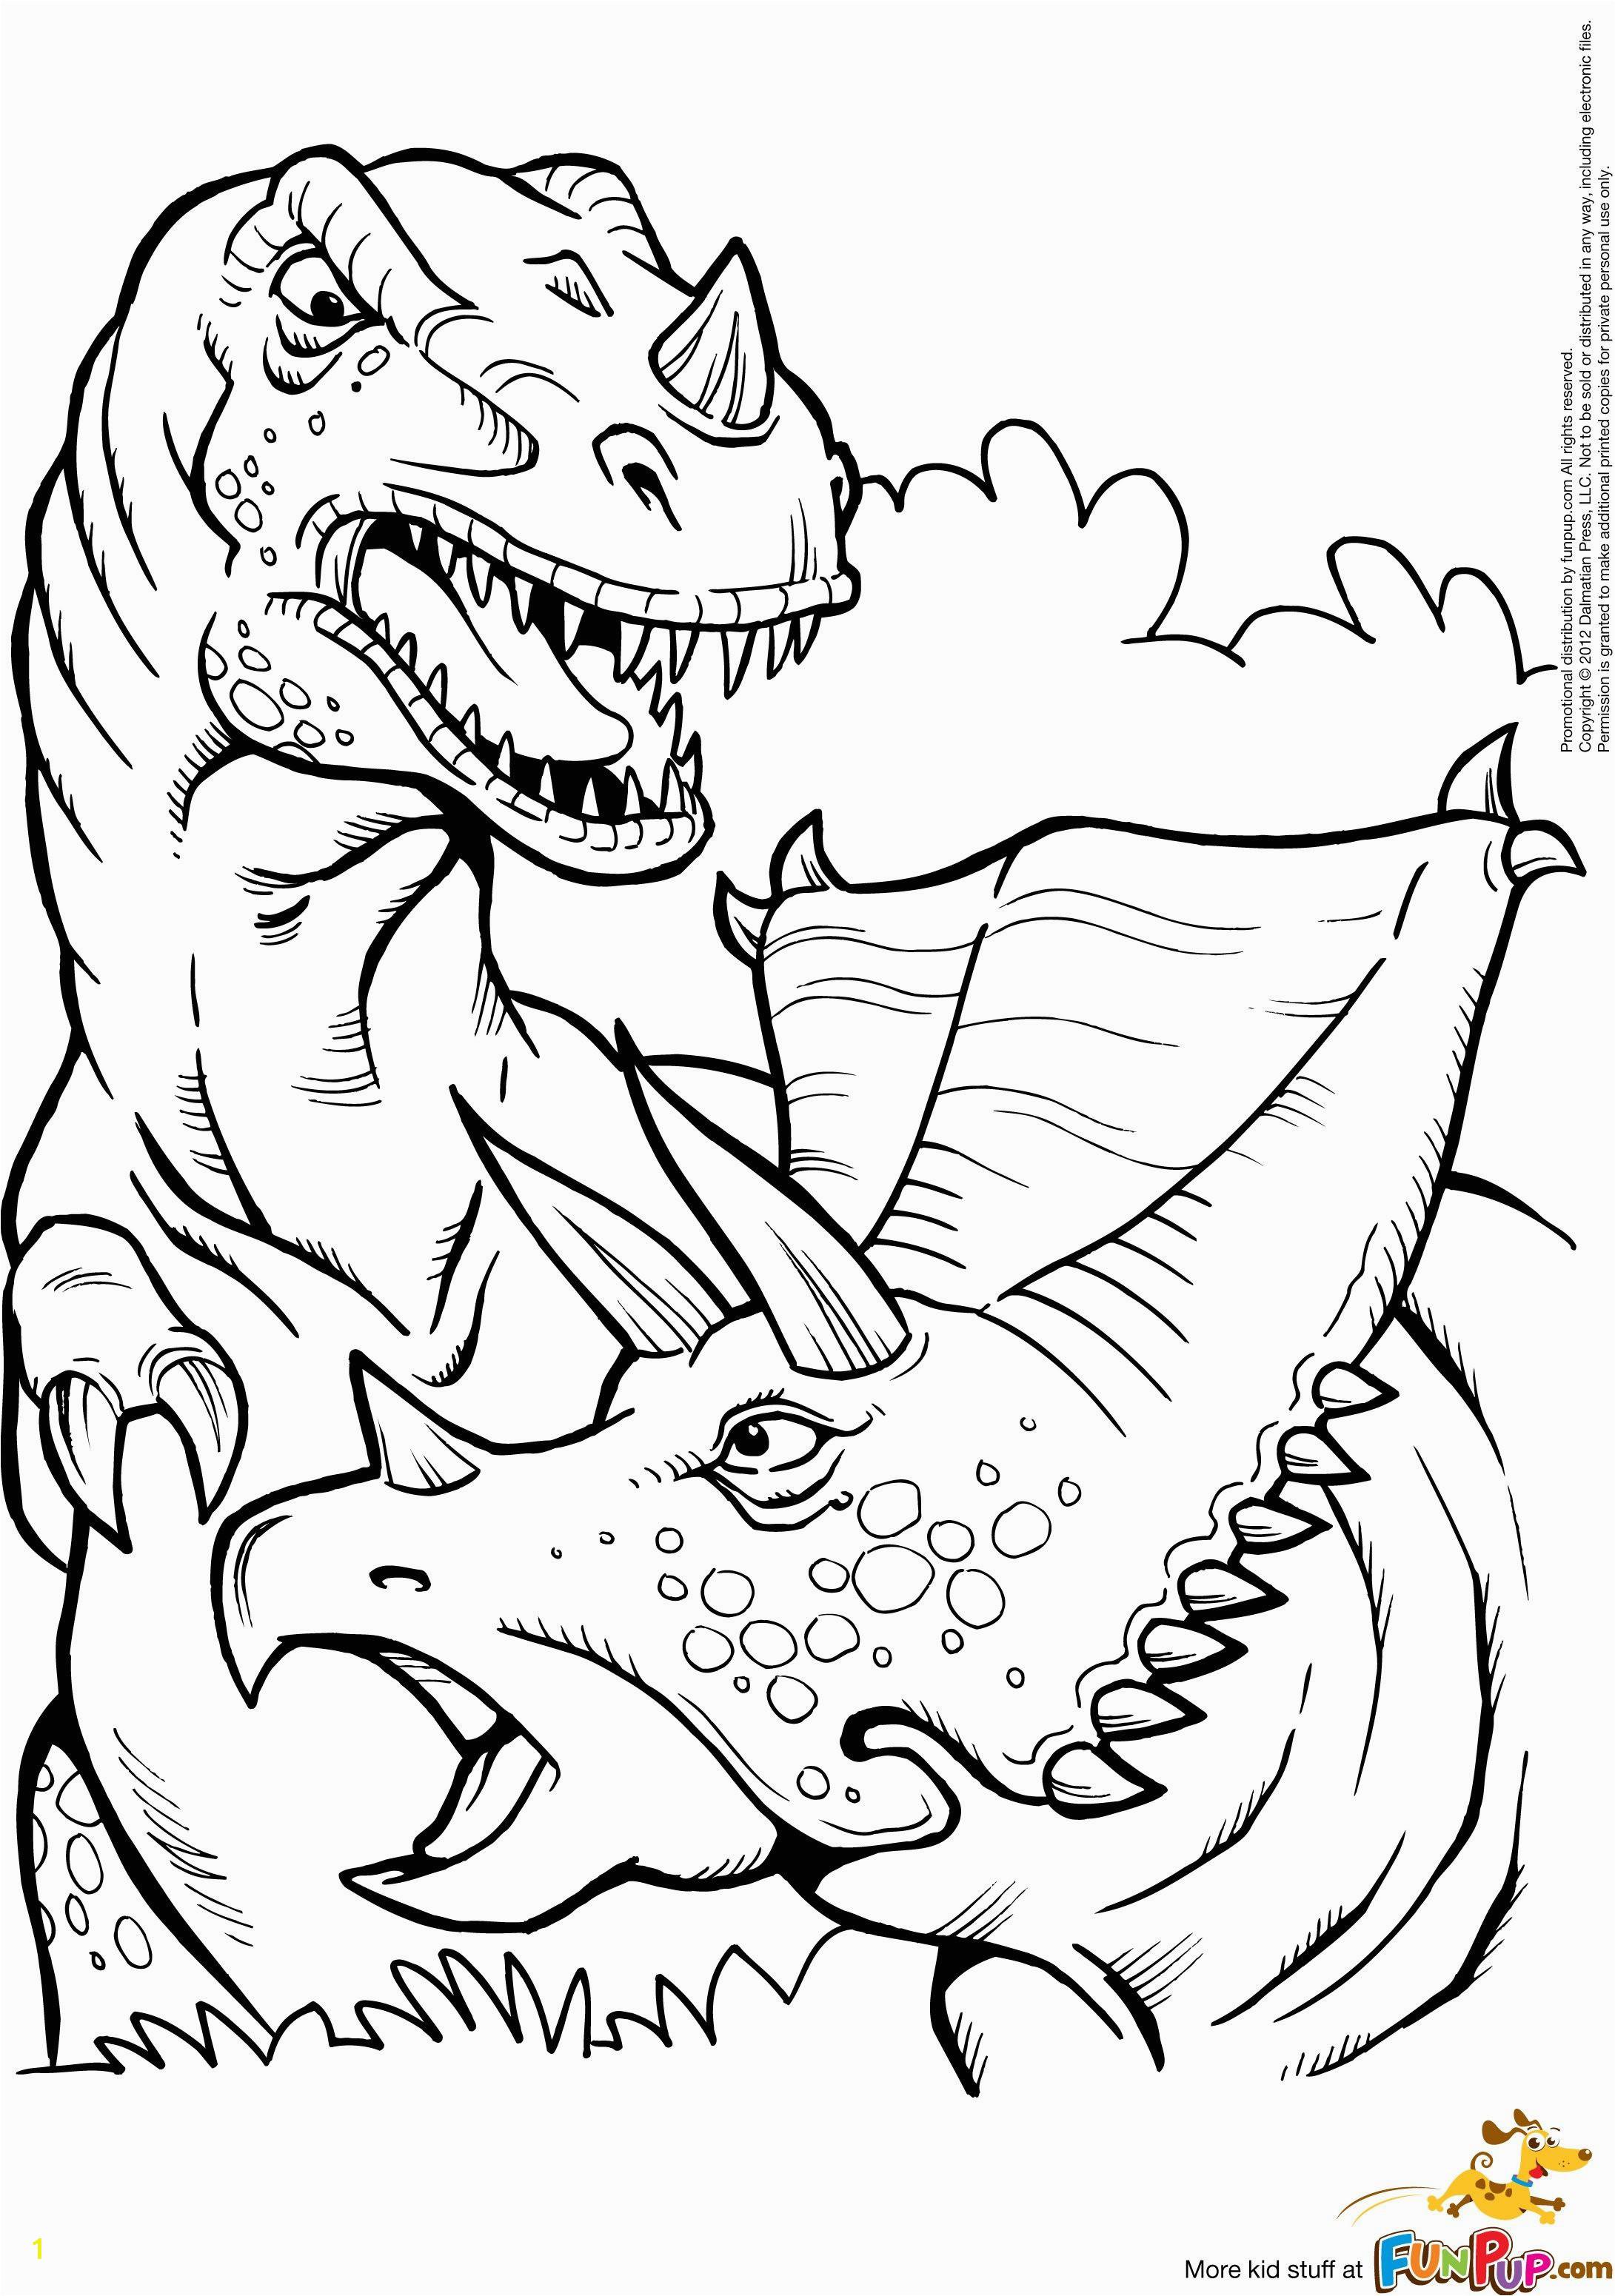 Kleurplaat Printable T Rex and Triceratops Coloring Page Schön Dinosaurier Rex Ausmalbilder